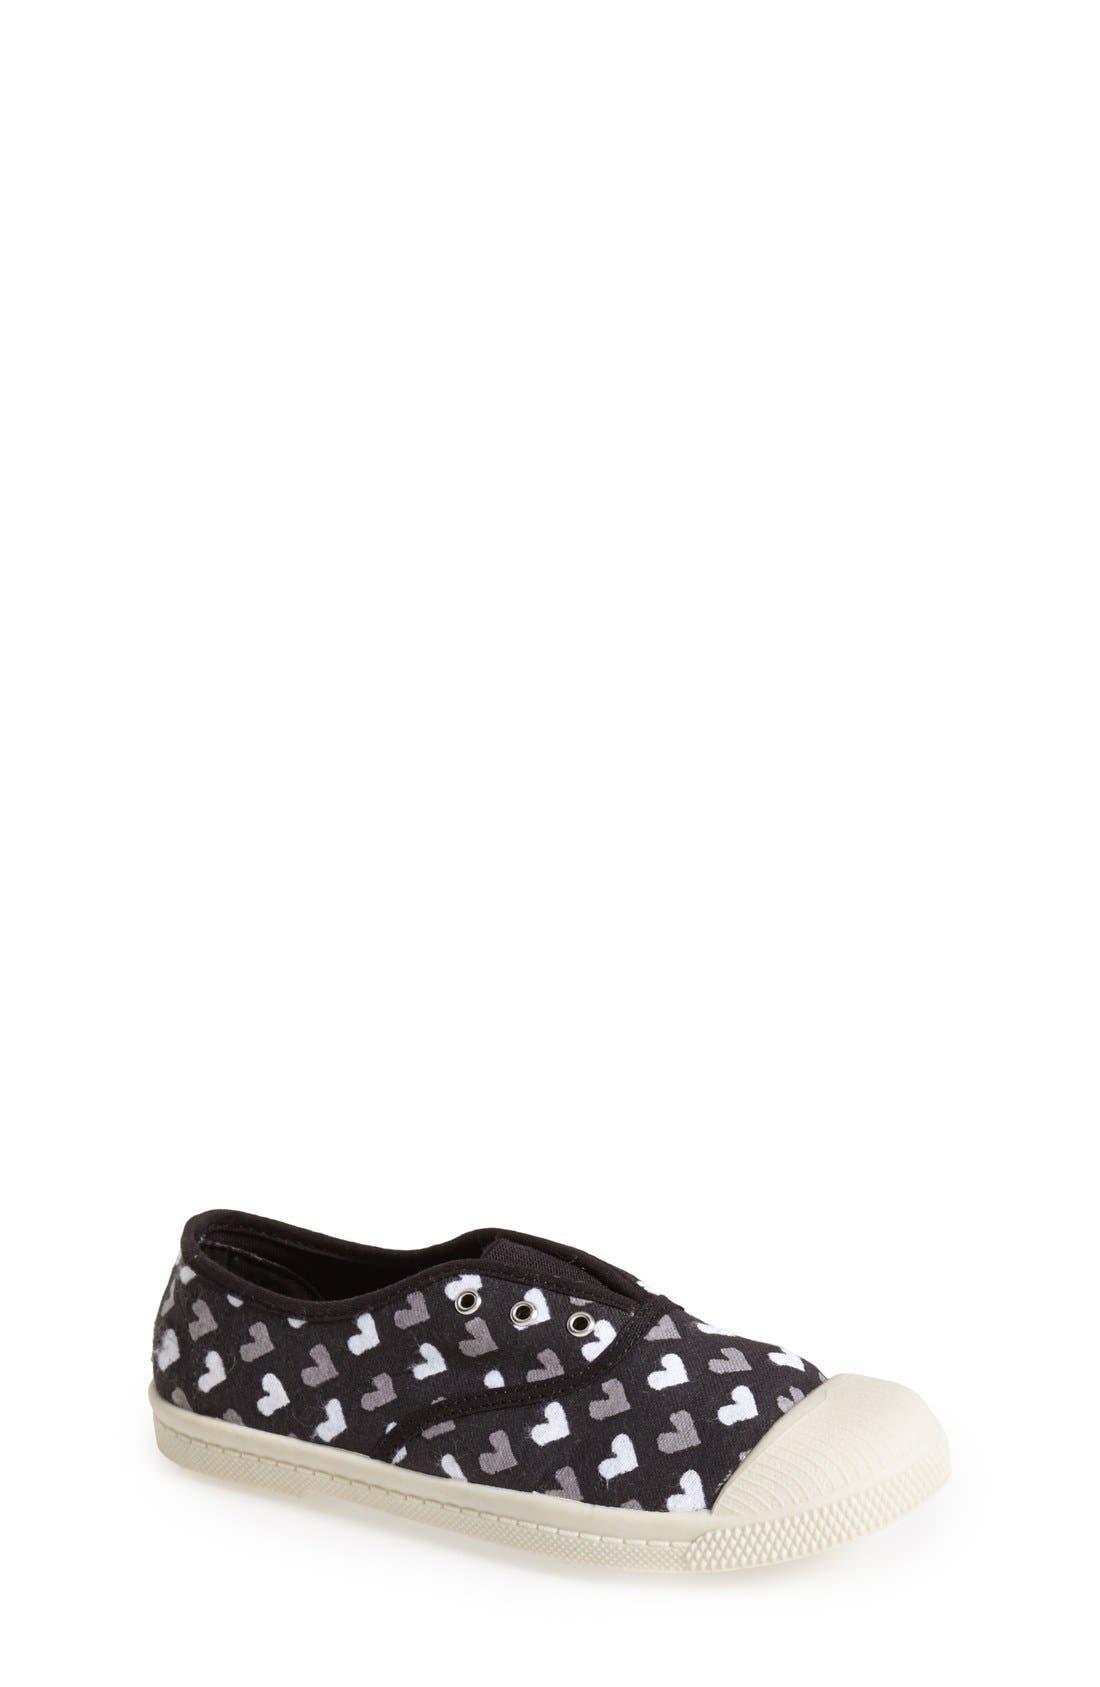 'Marin' Canvas Slip-On Sneaker,                         Main,                         color, 001